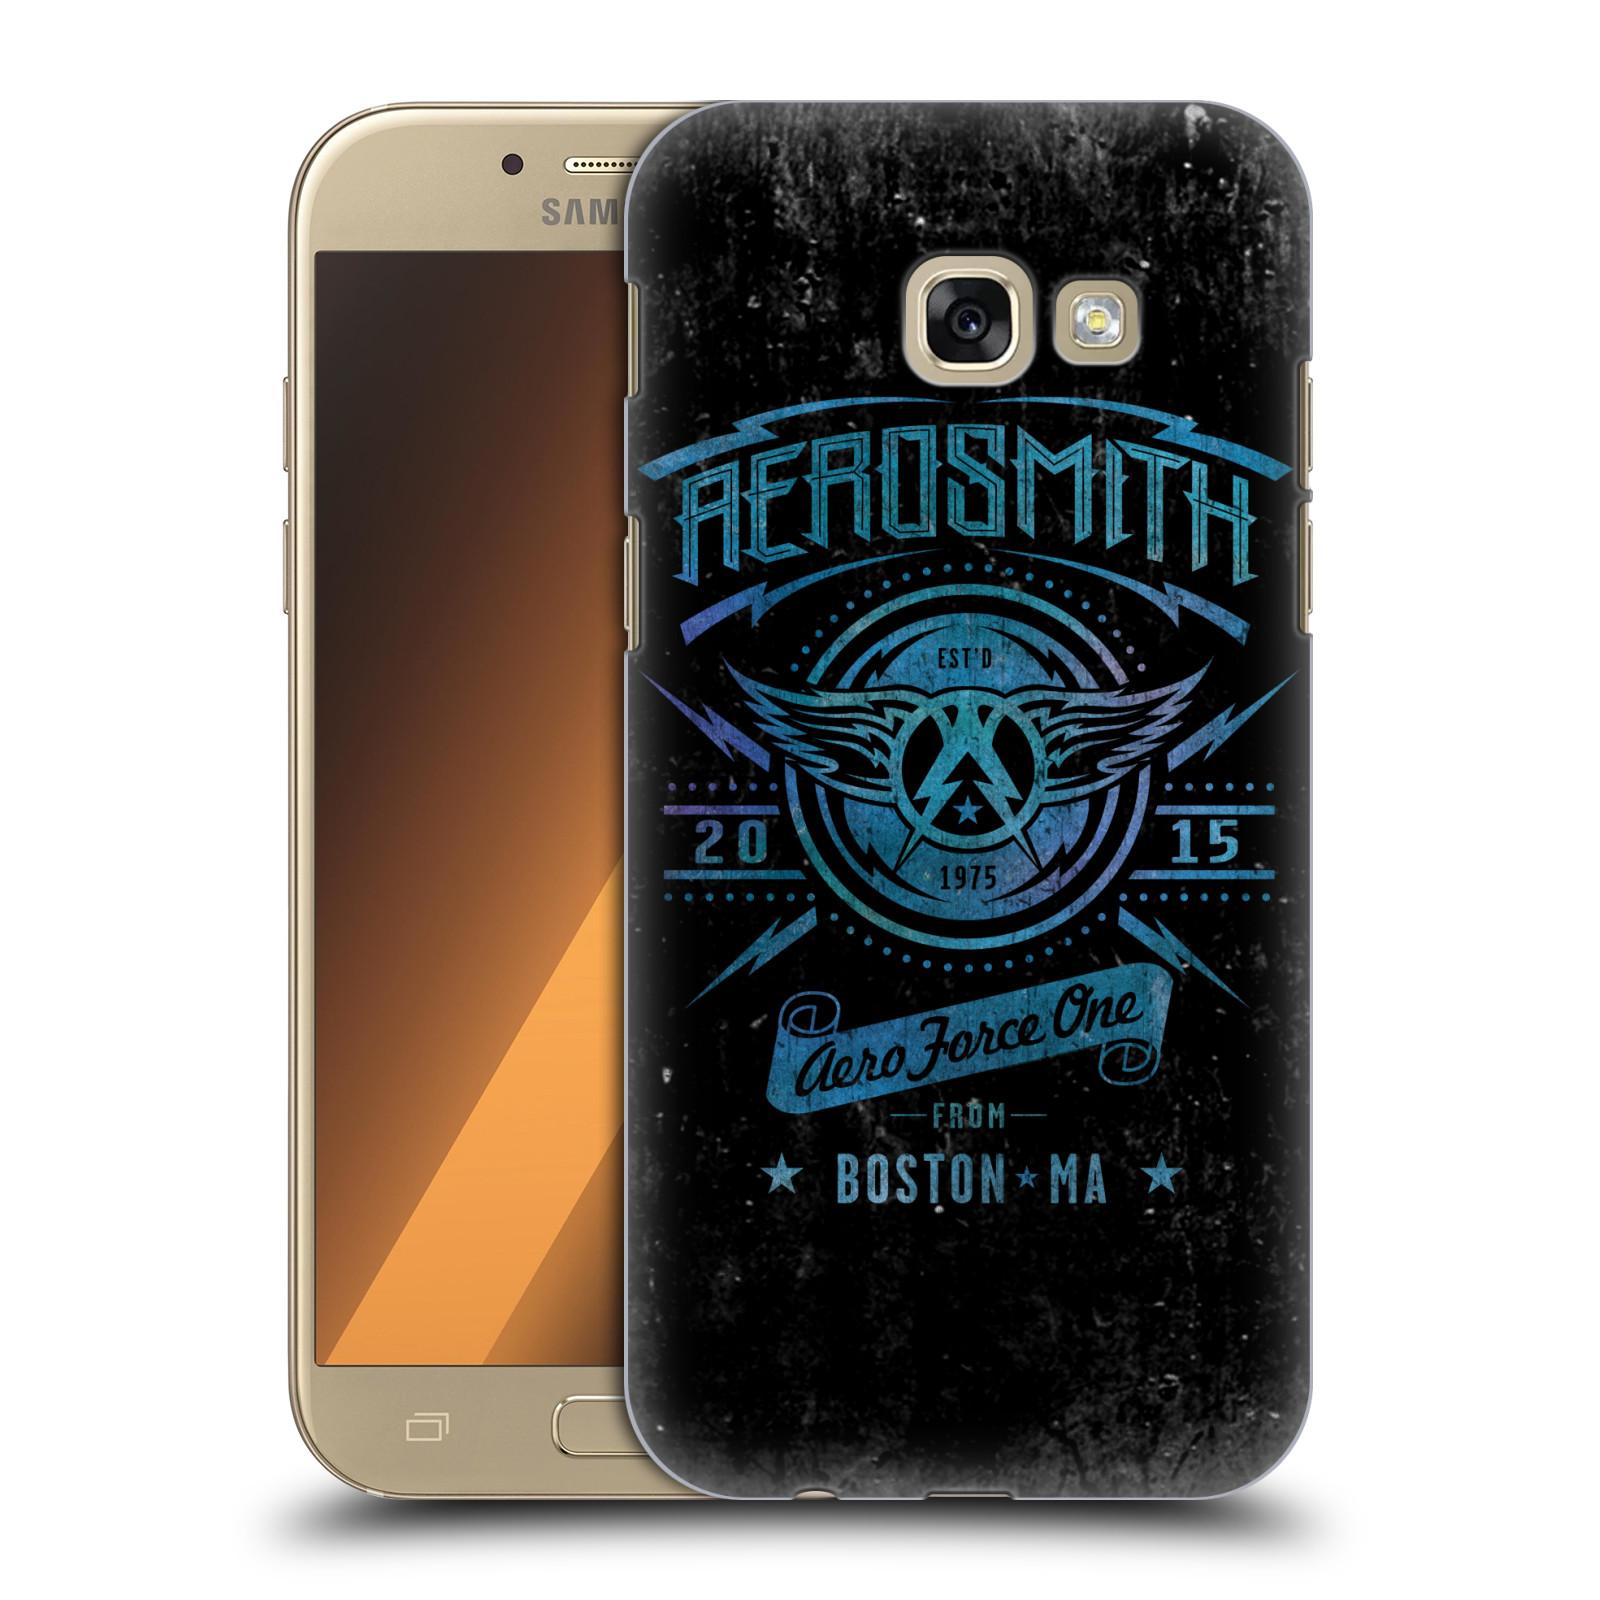 Plastové pouzdro na mobil Samsung Galaxy A5 (2017) HEAD CASE - Aerosmith - Aero Force One